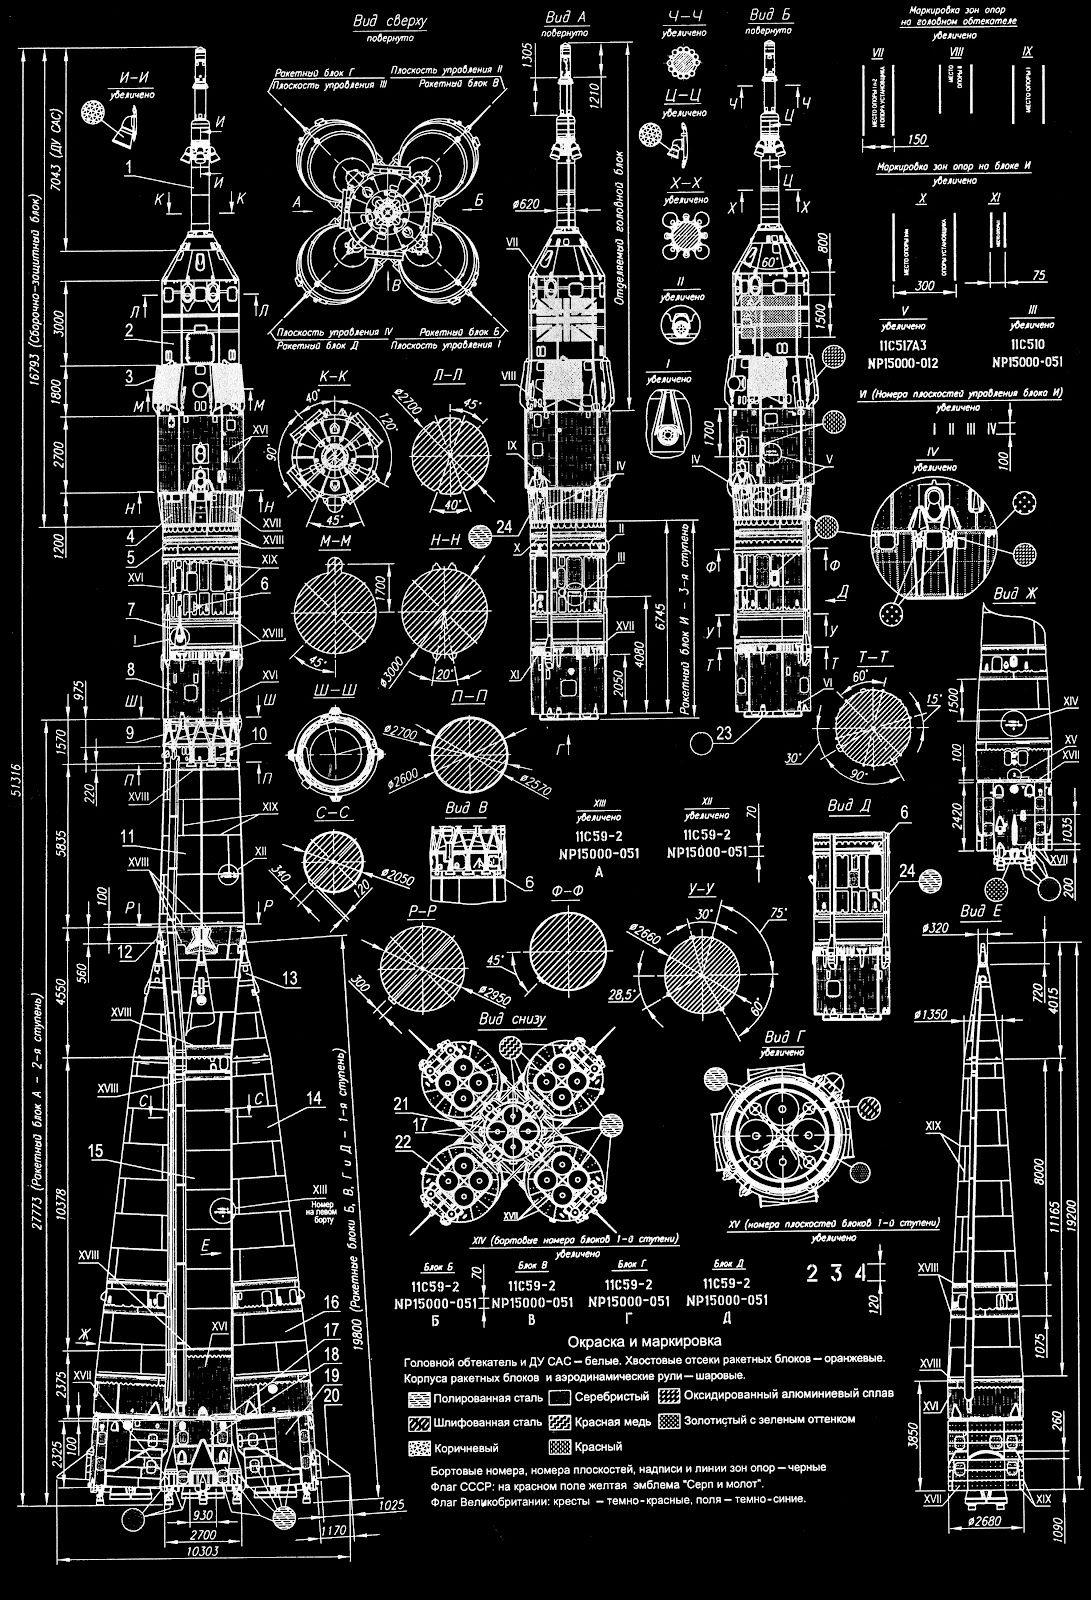 Thekhooll soyuz blueprint of a russian soyuz rocket click here to thekhooll soyuz blueprint of a russian soyuz rocket click here to view big malvernweather Gallery